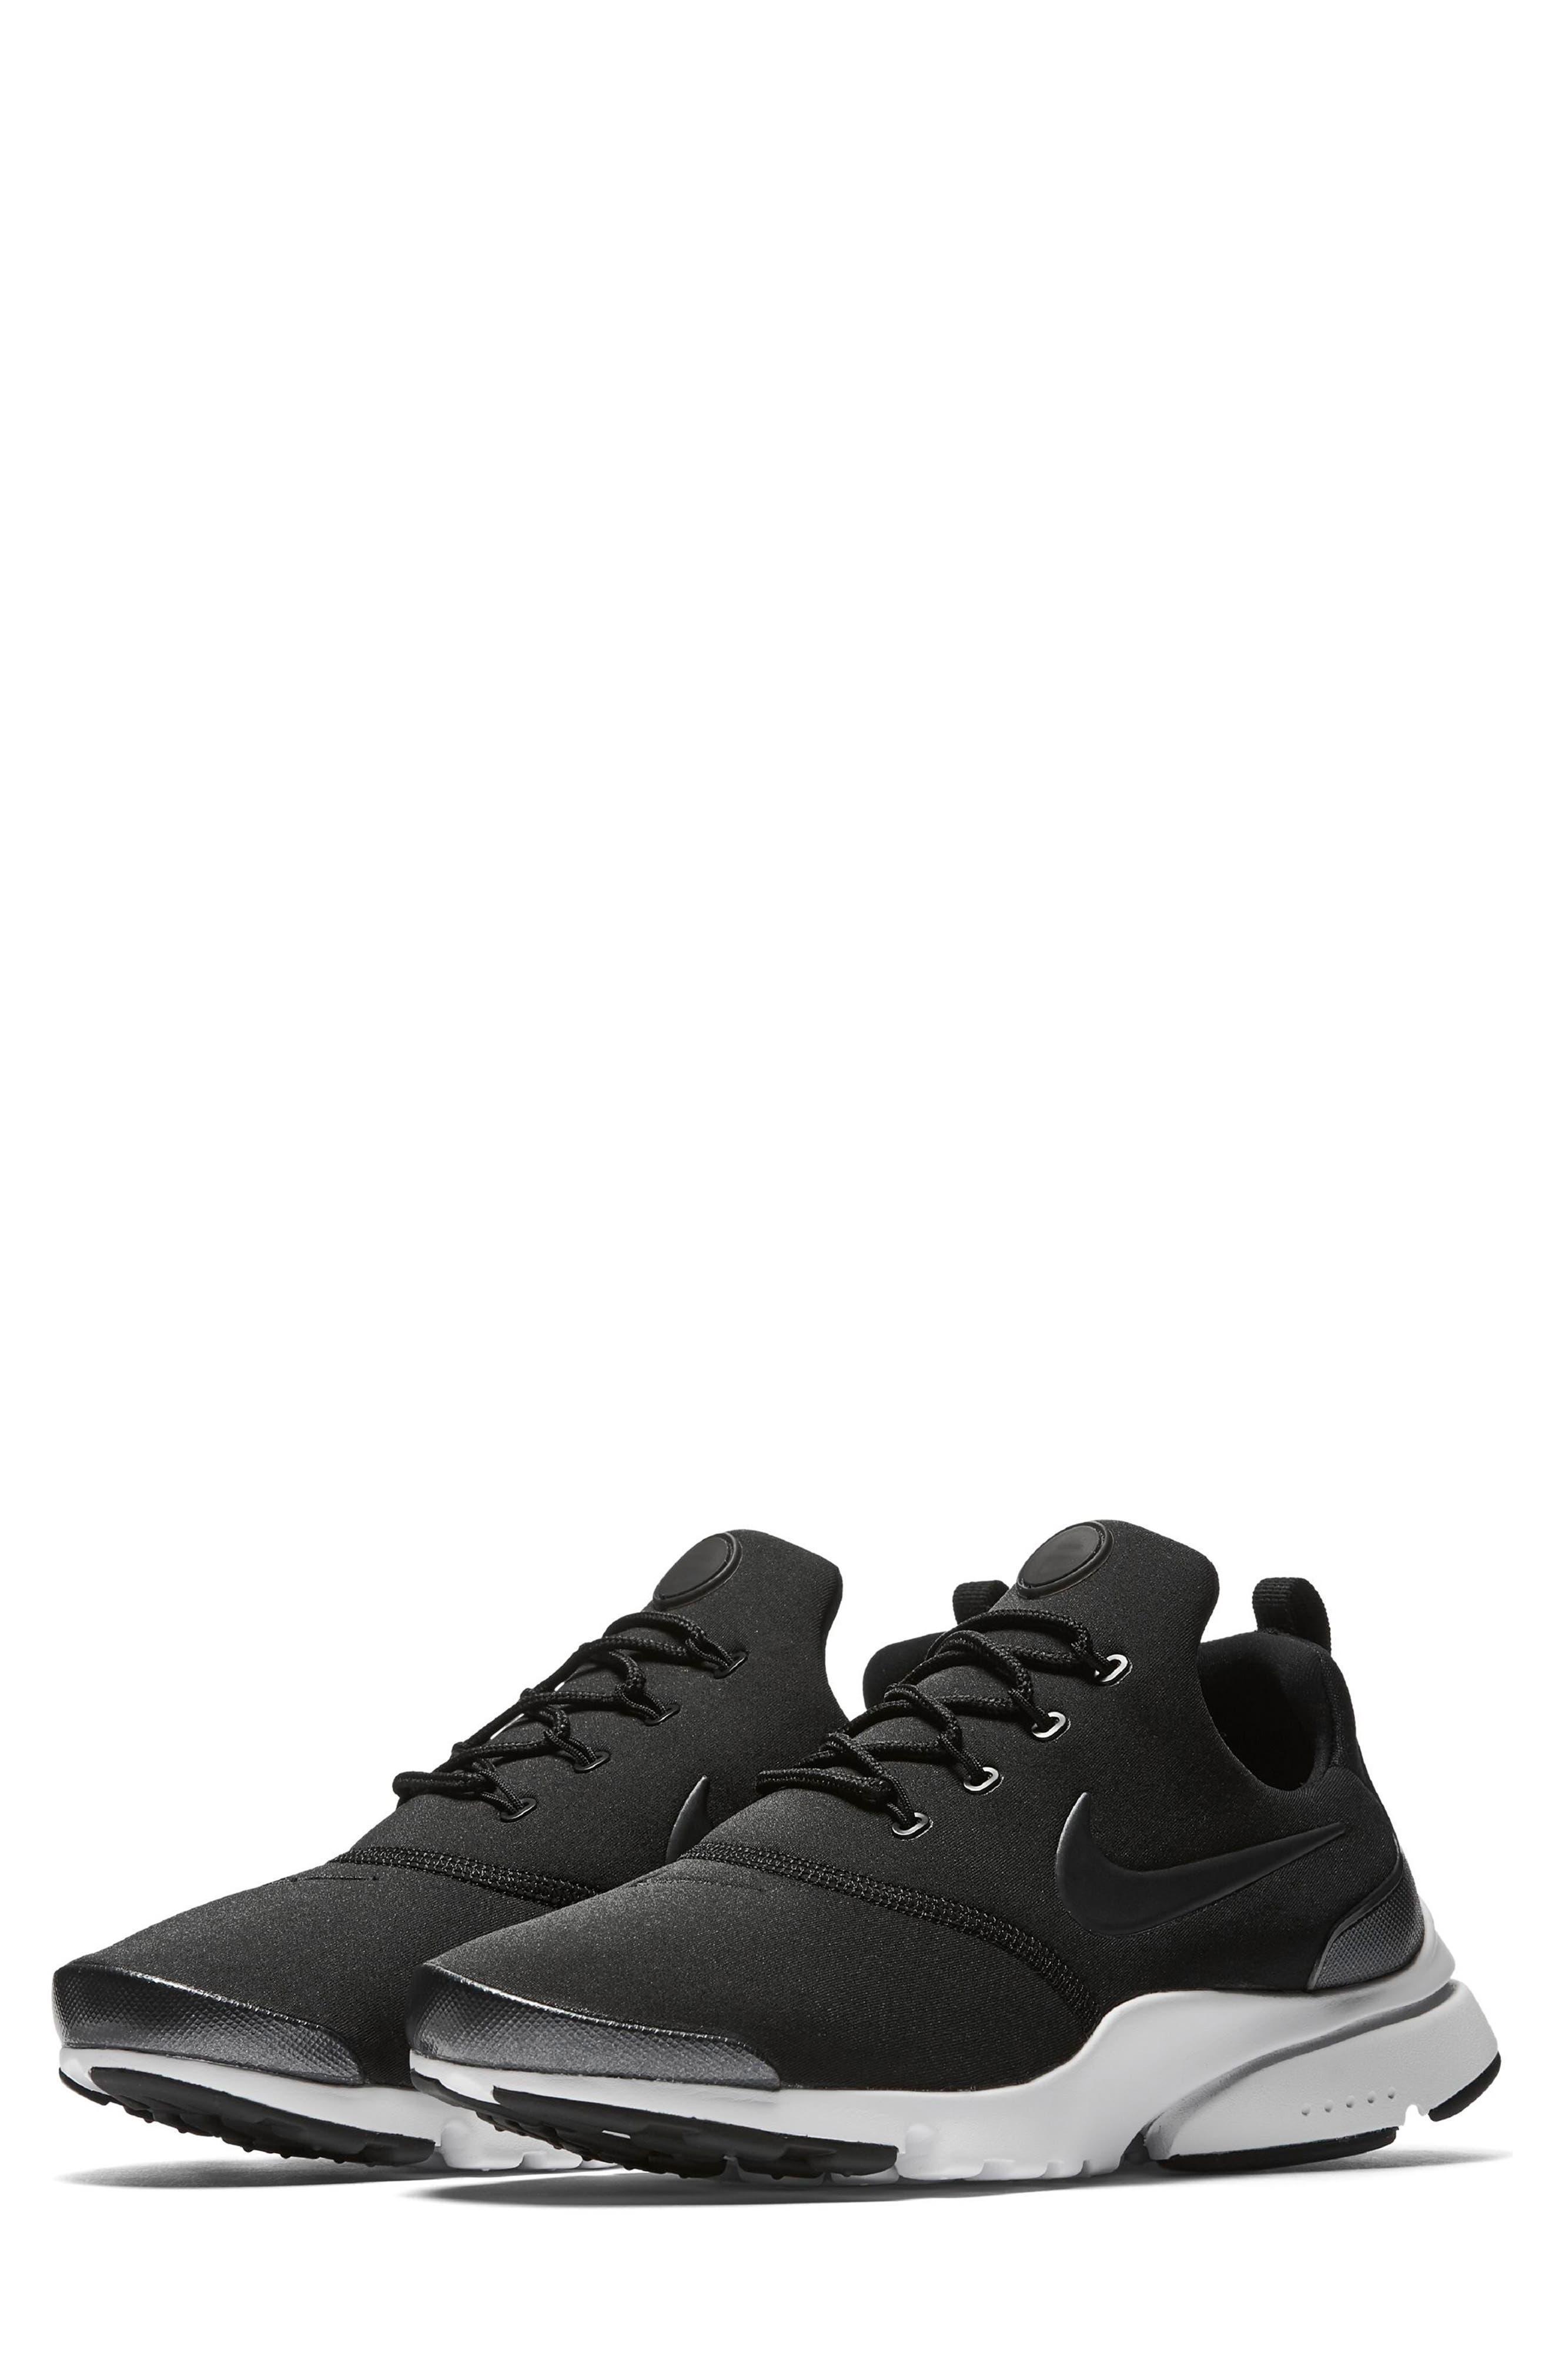 Presto Ultra SE Sneaker,                         Main,                         color, Black/ Grey/ White